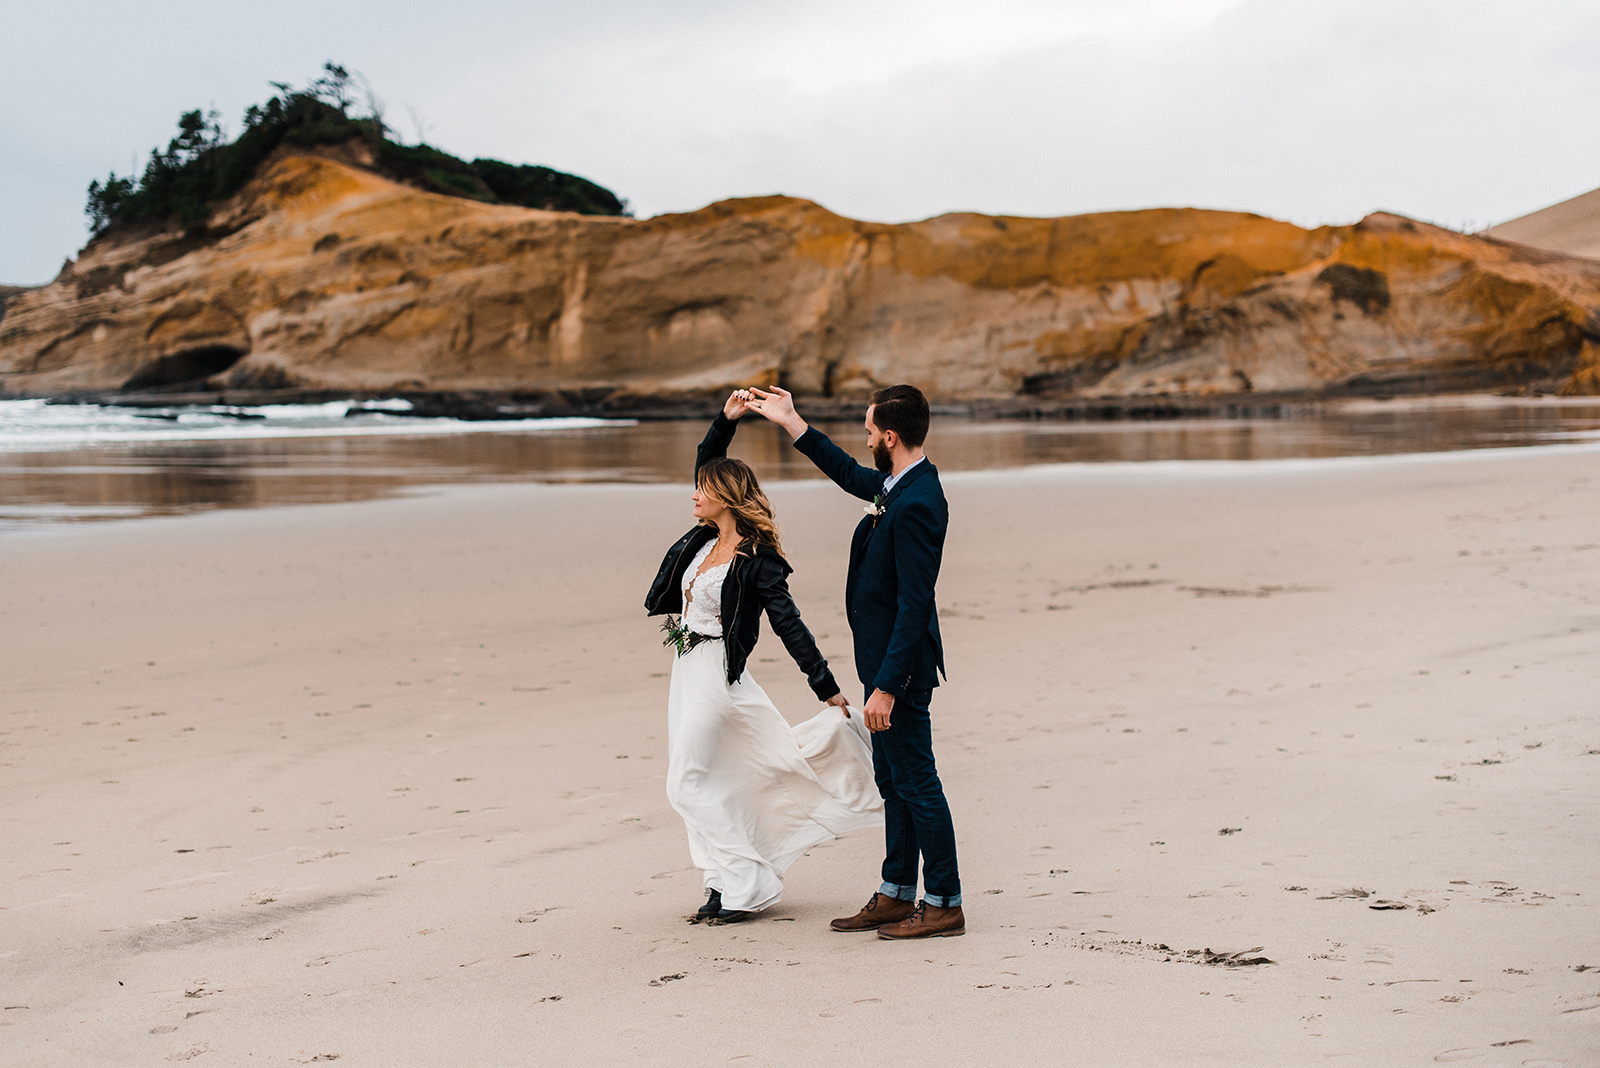 Oregon_Coast_Elopement_Wedding_The_Foxes_Photography_077-2.jpg